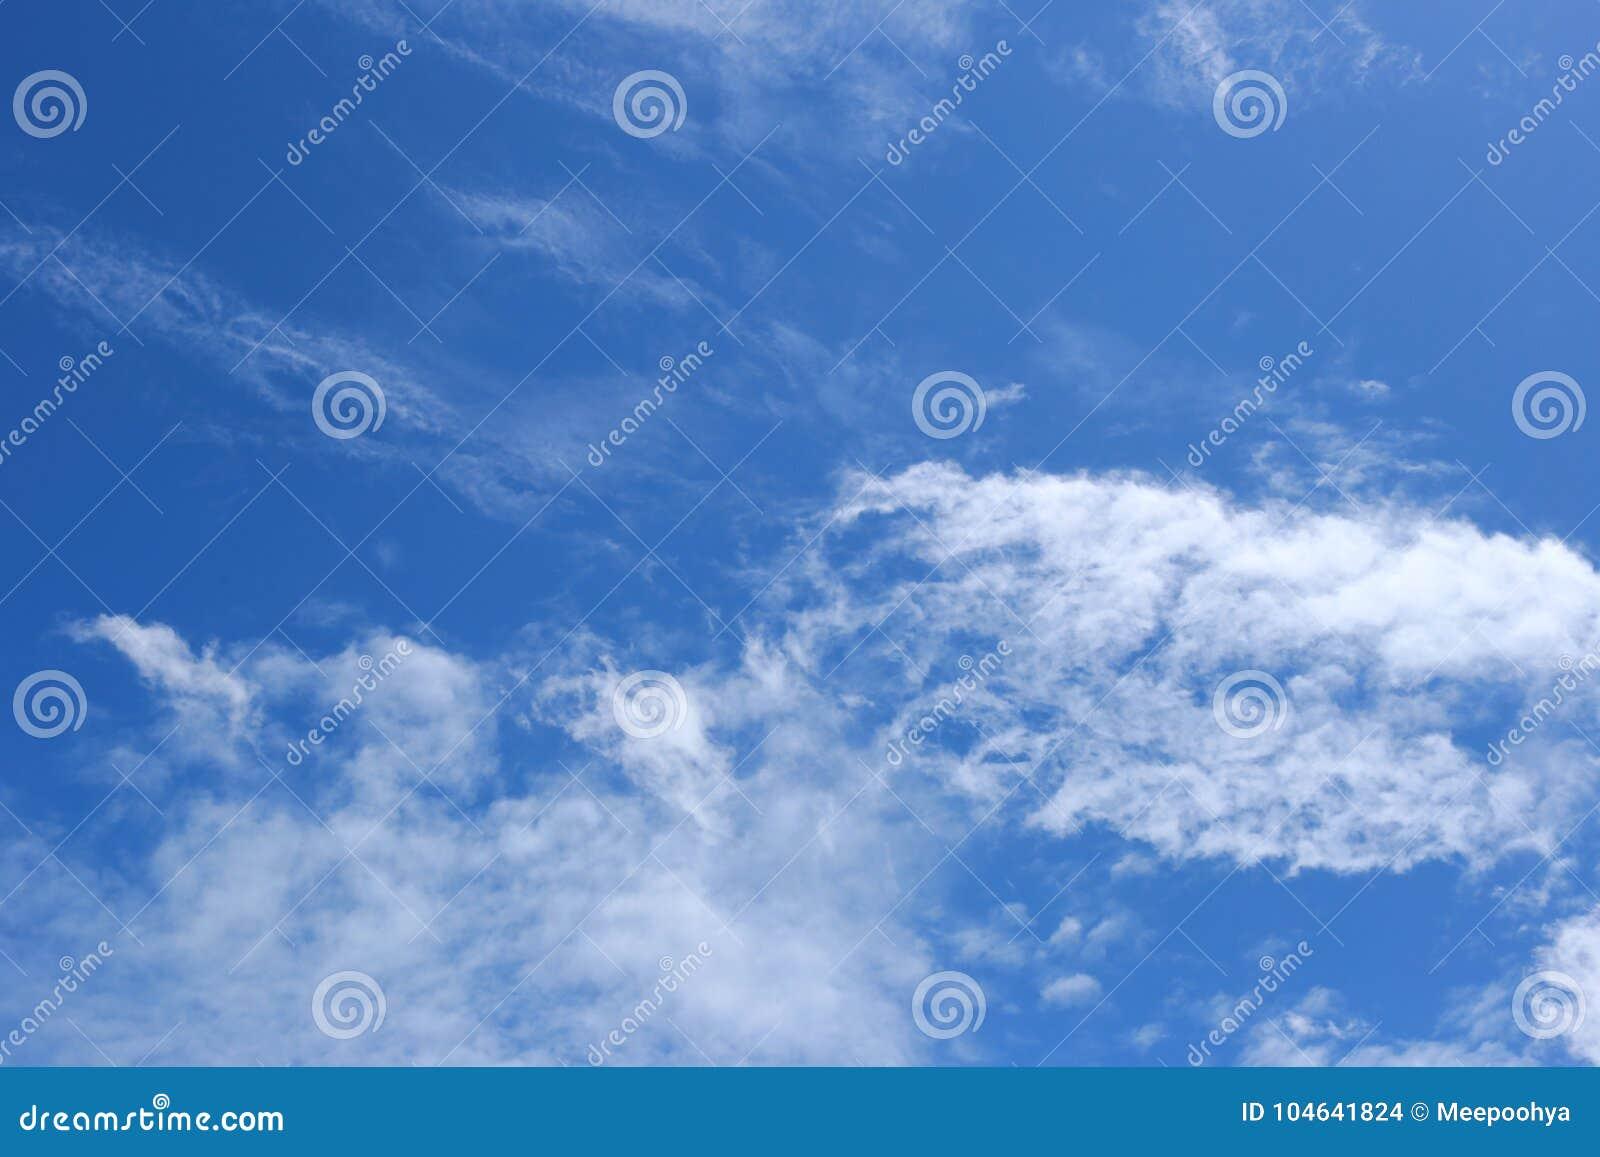 Download Wolk Op Blauwe Hemel In De Dag Stock Foto - Afbeelding bestaande uit wolk, milieu: 104641824